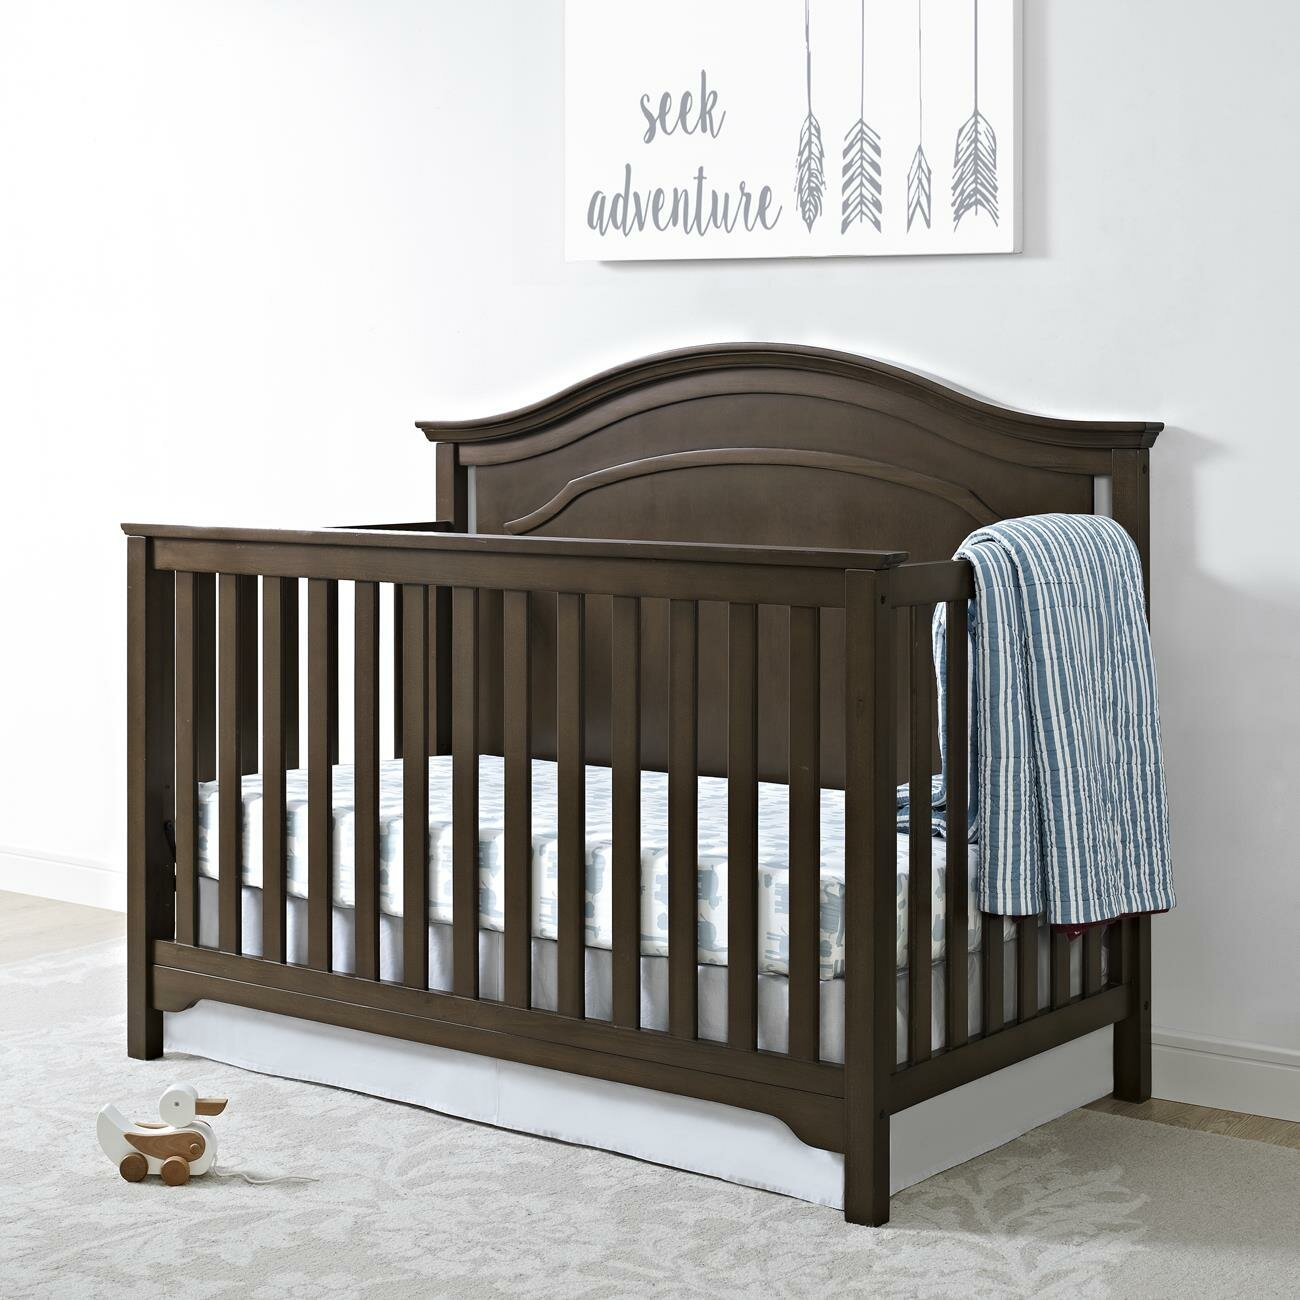 baby relax eddie bauer hayworth 4 in 1 convertible crib baby nursery furniture relax emma